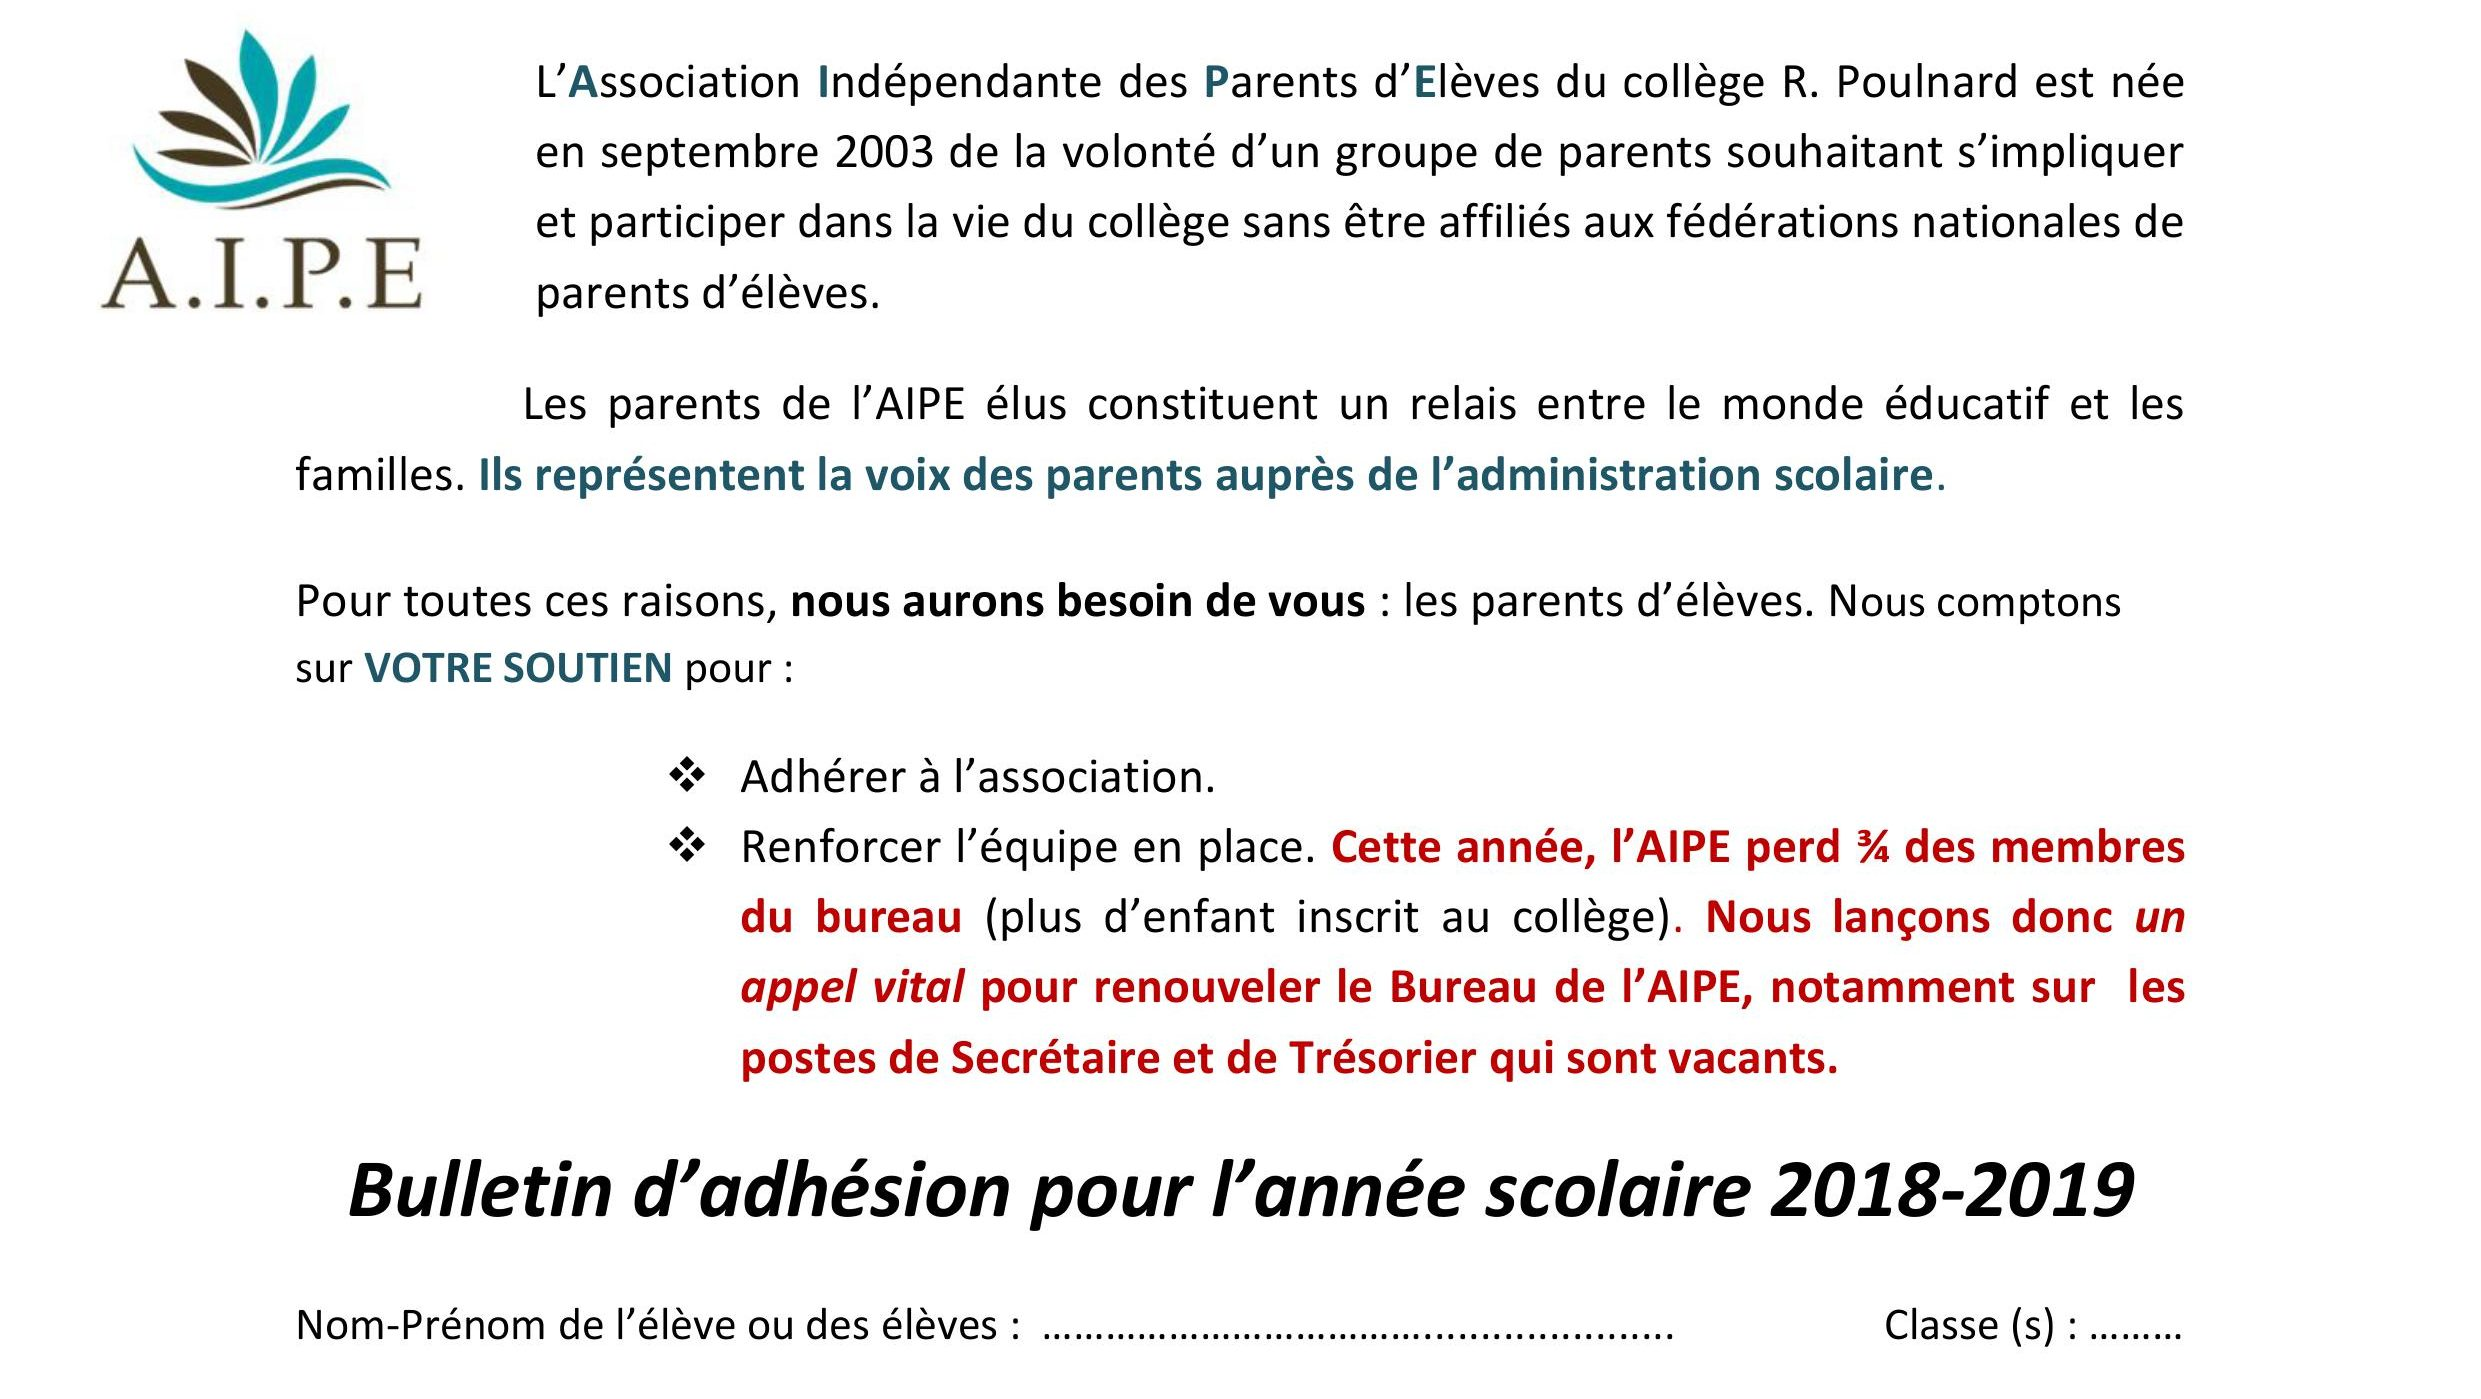 Bulletin Adhésion AIPE 2018-2019.jpg